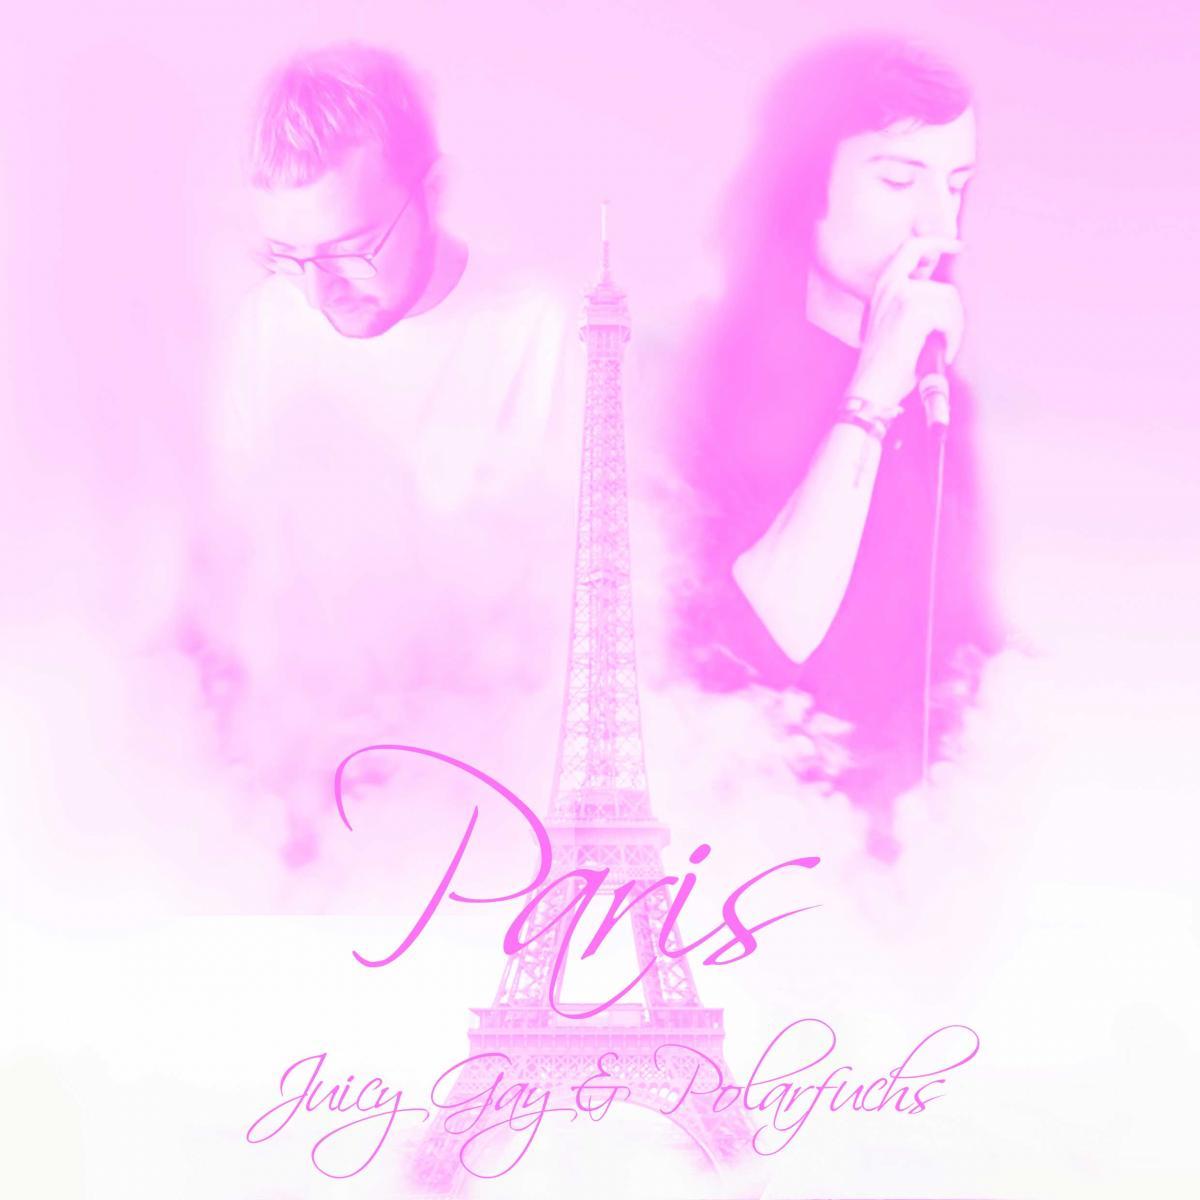 Upcoming: Juicy Gay & Polarfuchs - Paris (Remix)